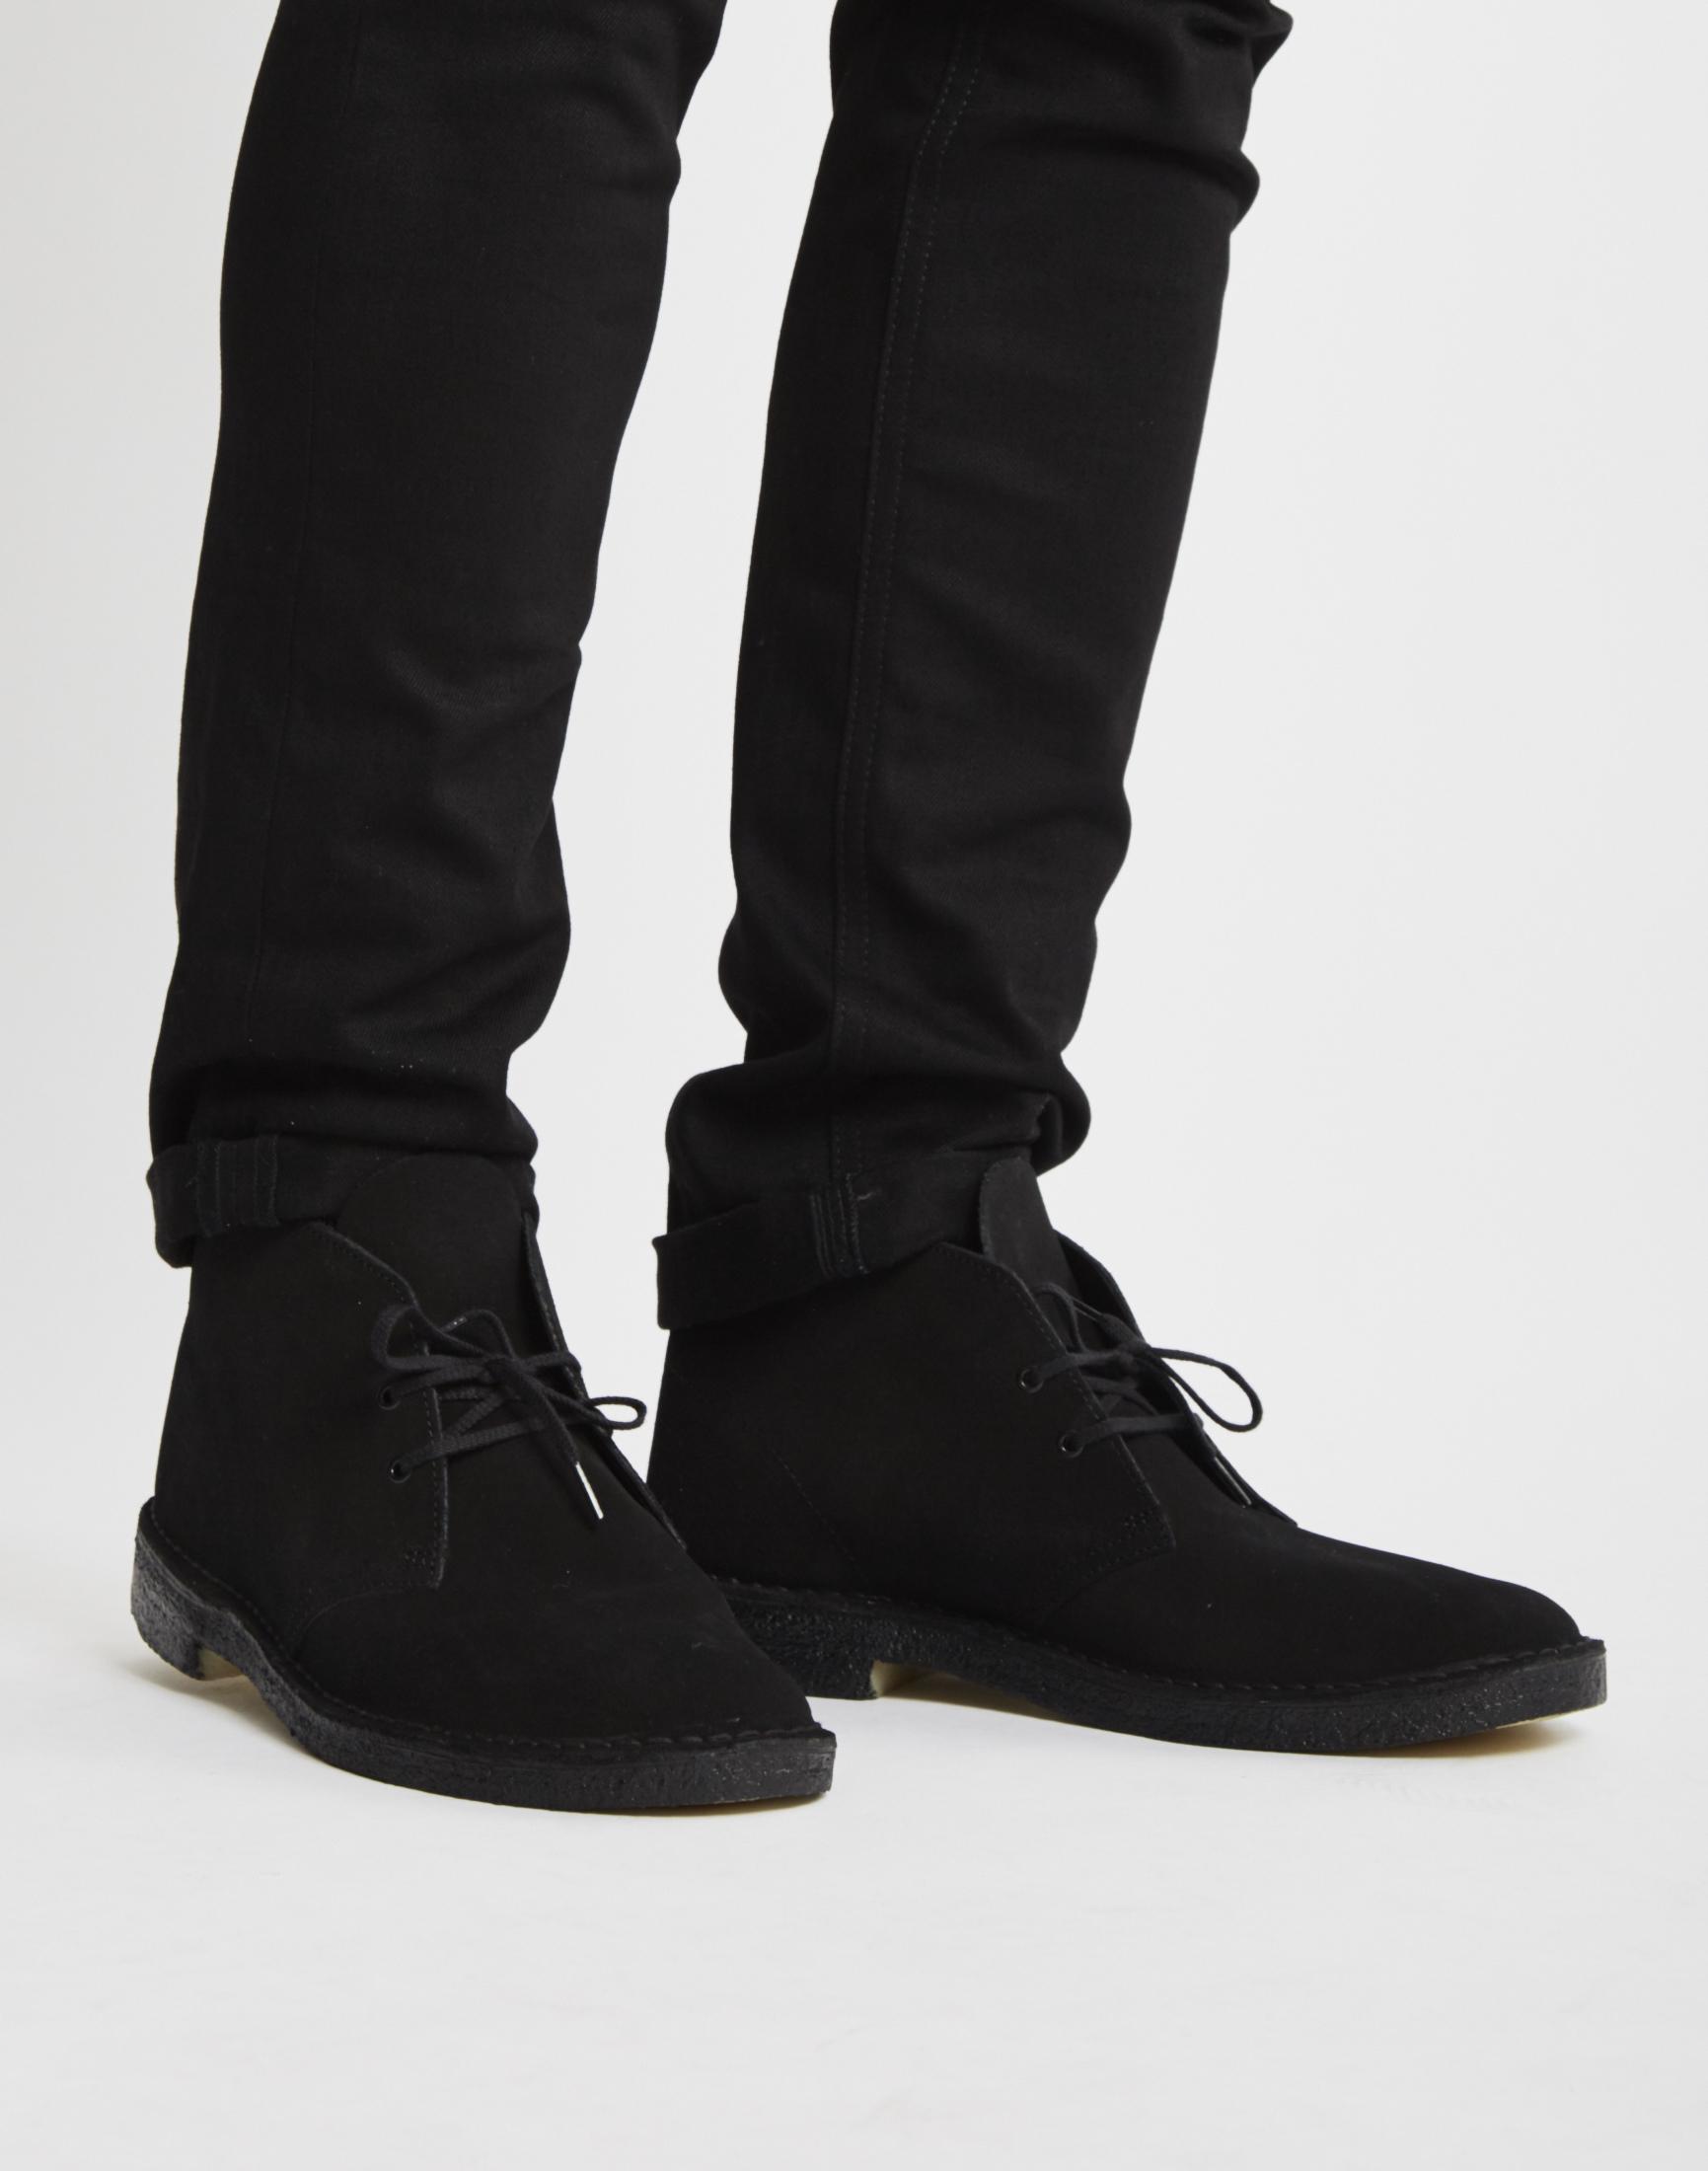 clarks s desert boots black principle systems ltd